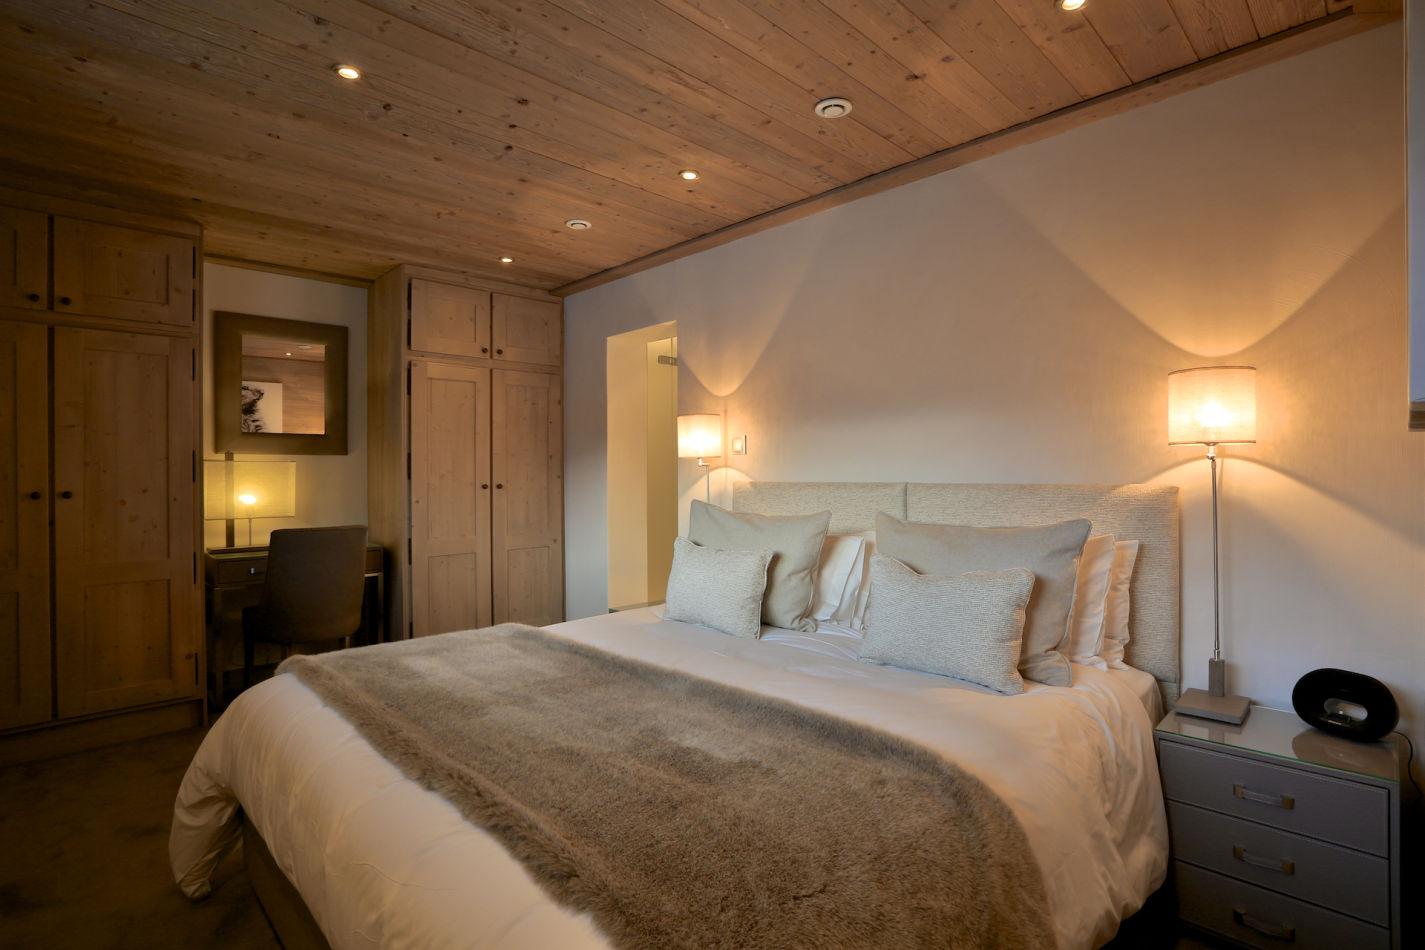 bedroom-5-daytime-image-98